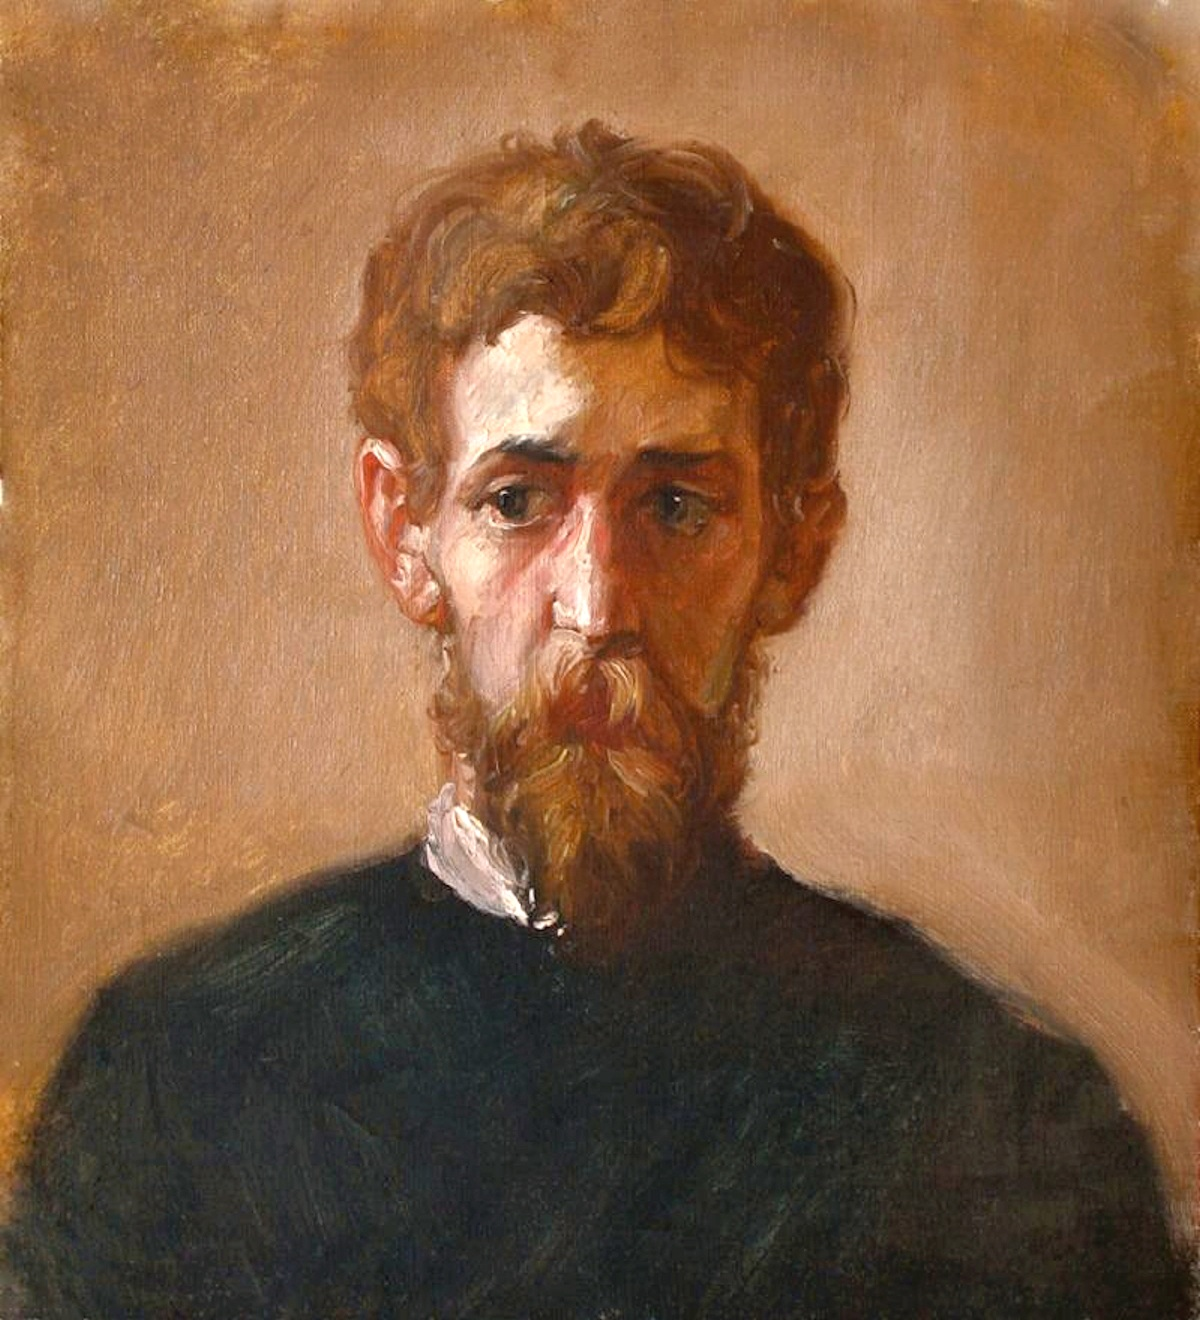 00 Mikhail Shankov. Grigori Chernousov. 1983